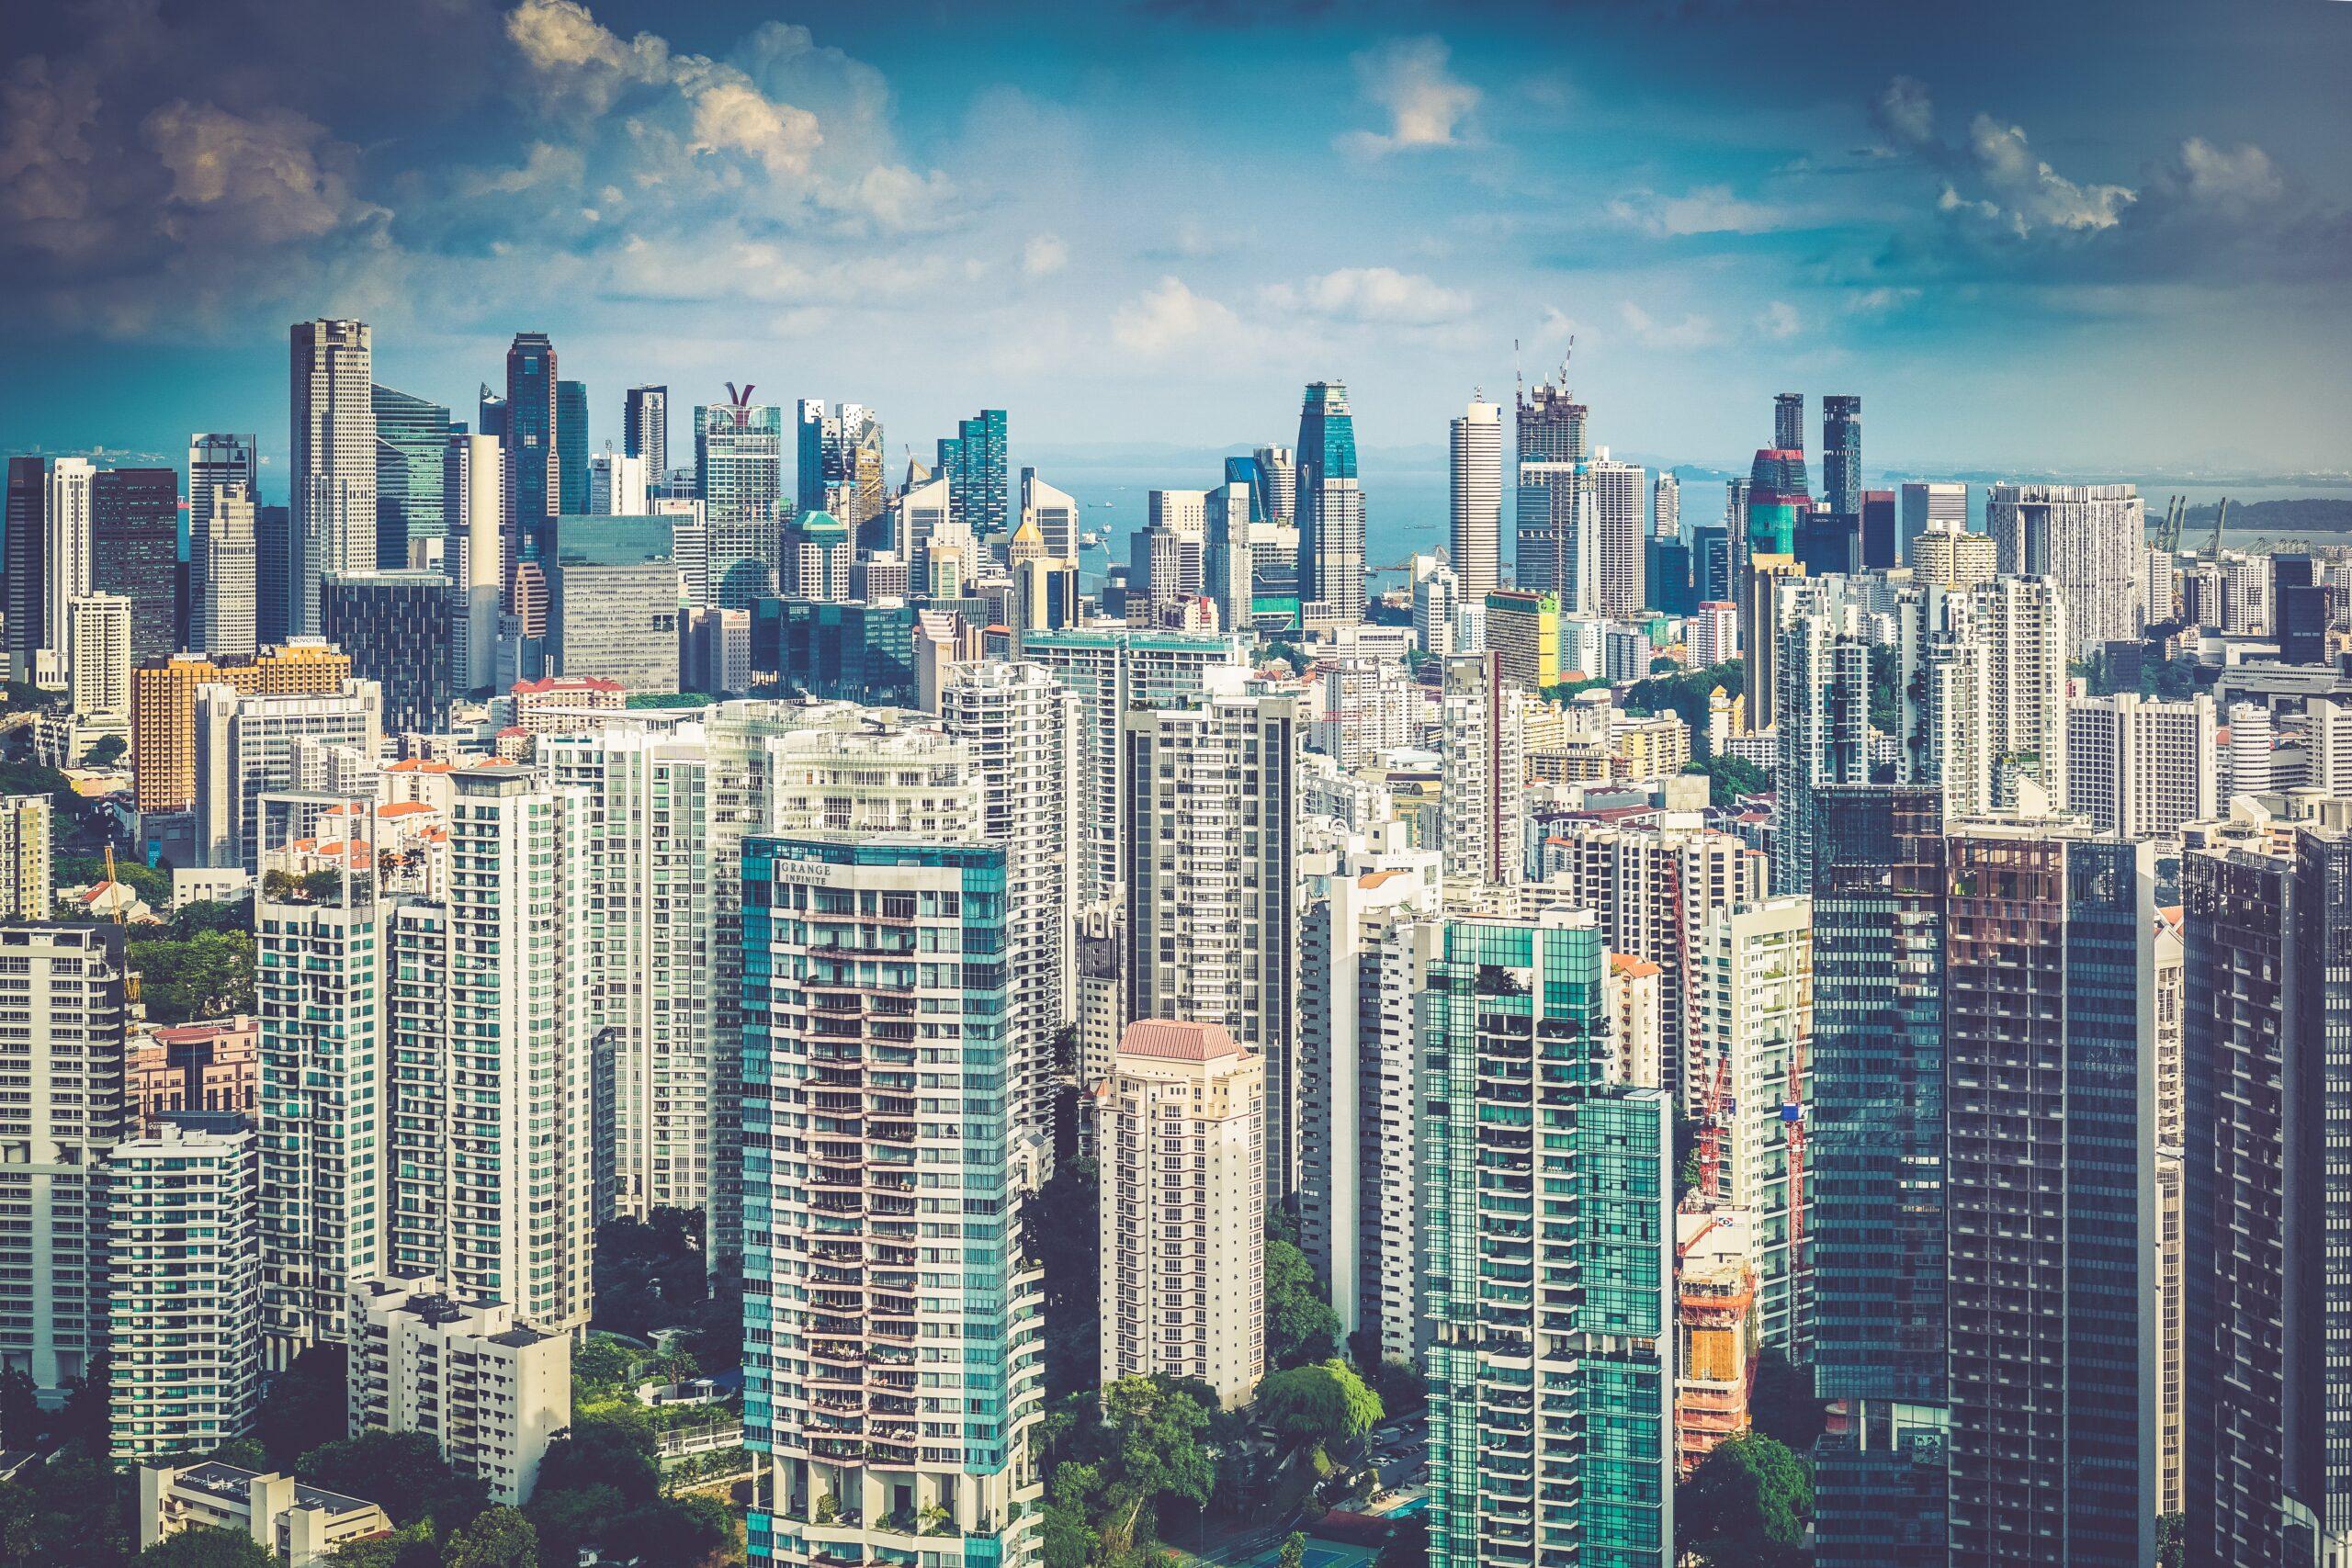 Cityscape of Singapore island